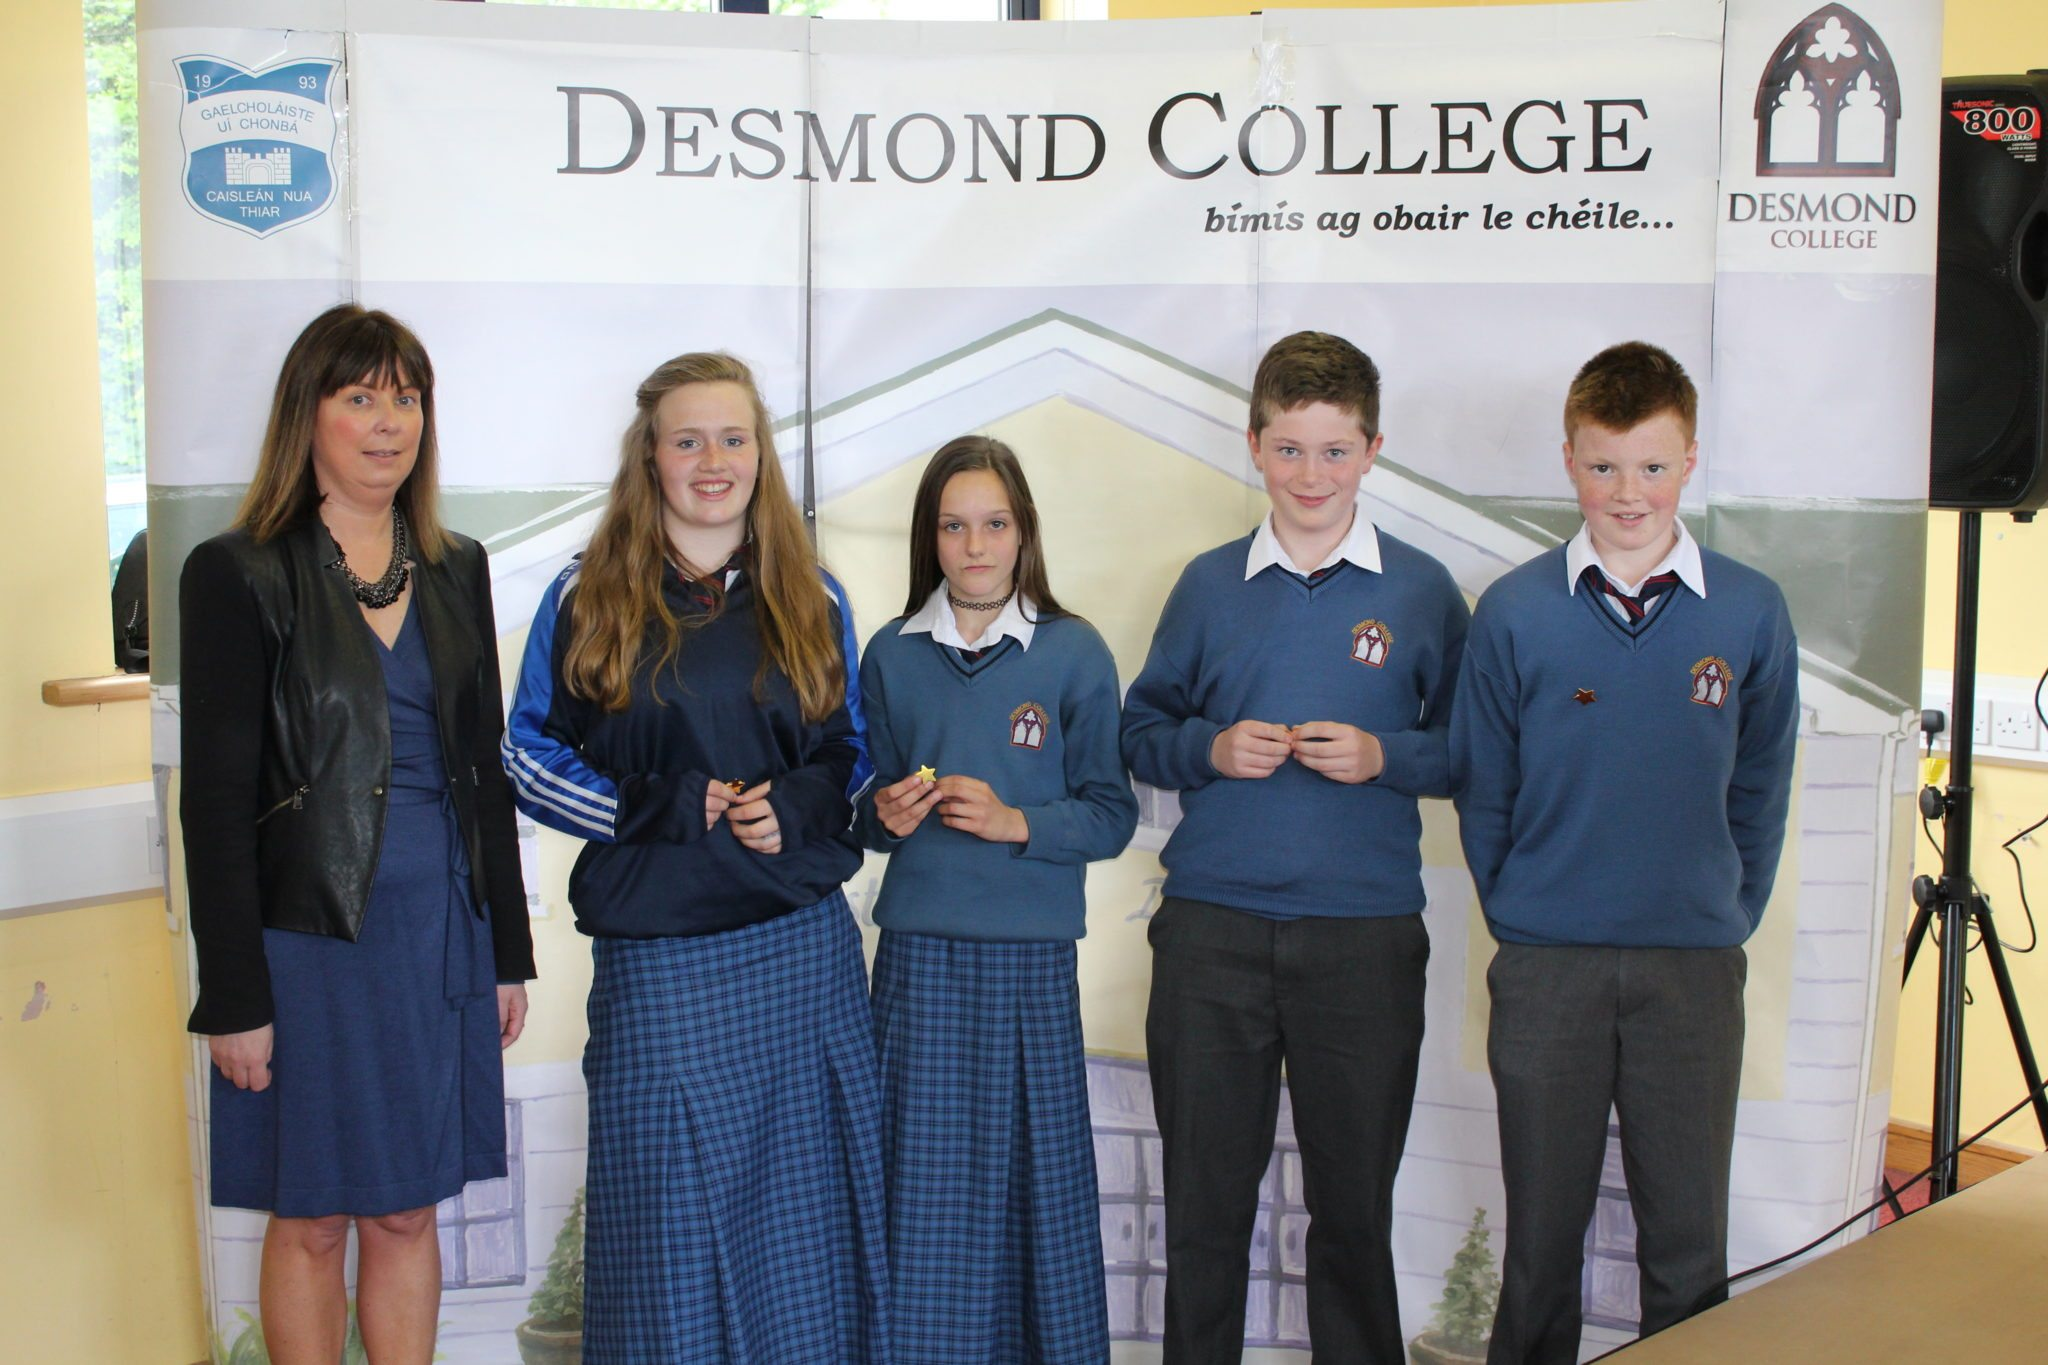 Desmond College Student Awards: May 2015: DEDICATION AND COMMITMENT AWARDS: 1st year: Ms Cregan with Breda Magner, Cliona Blenkinsop, Bryan Hartigan and Diarmuid O'Flynn